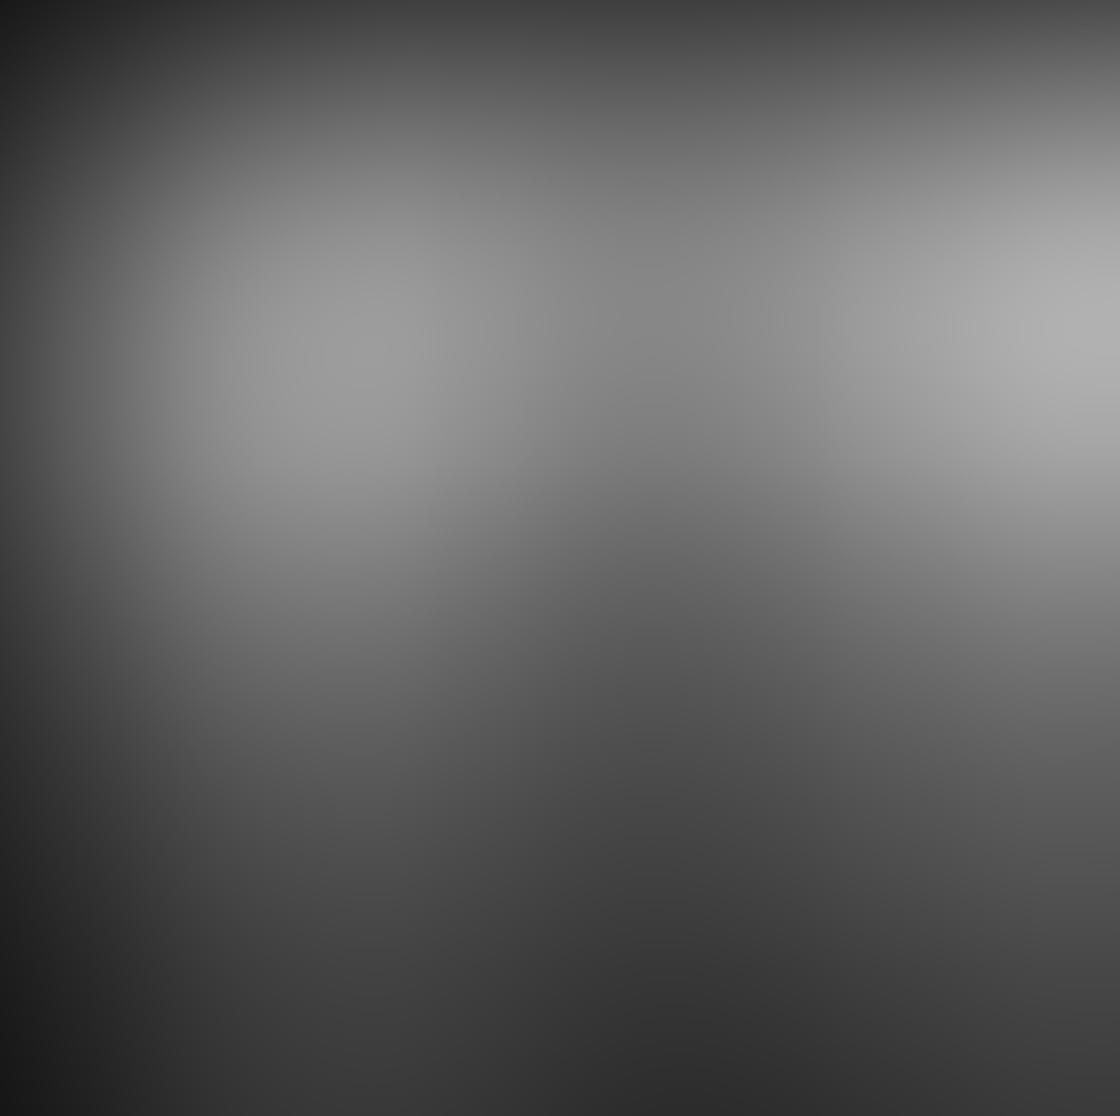 iPhone Photos Black White 10